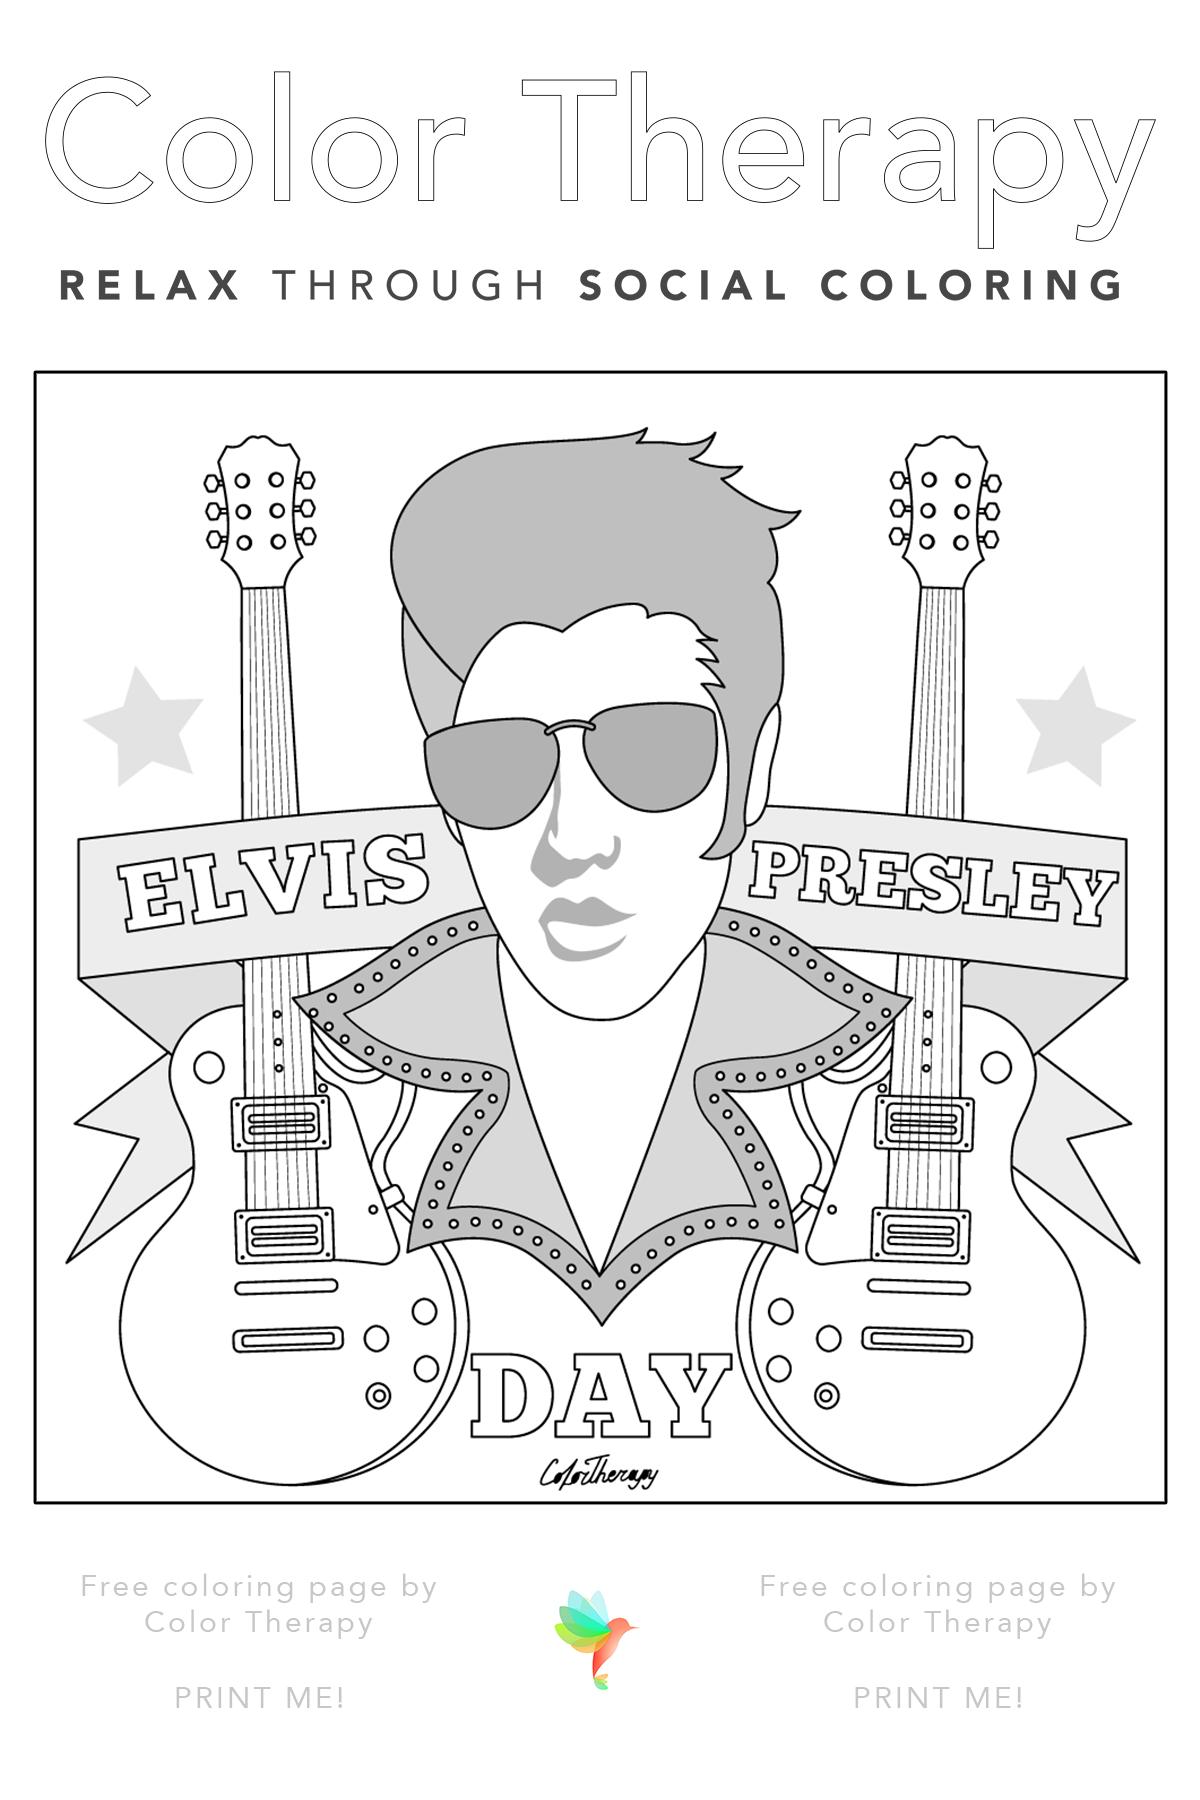 Elvis Presley Coloring Pages : elvis, presley, coloring, pages, Color, Therapy, Coloring, Pages,, Books